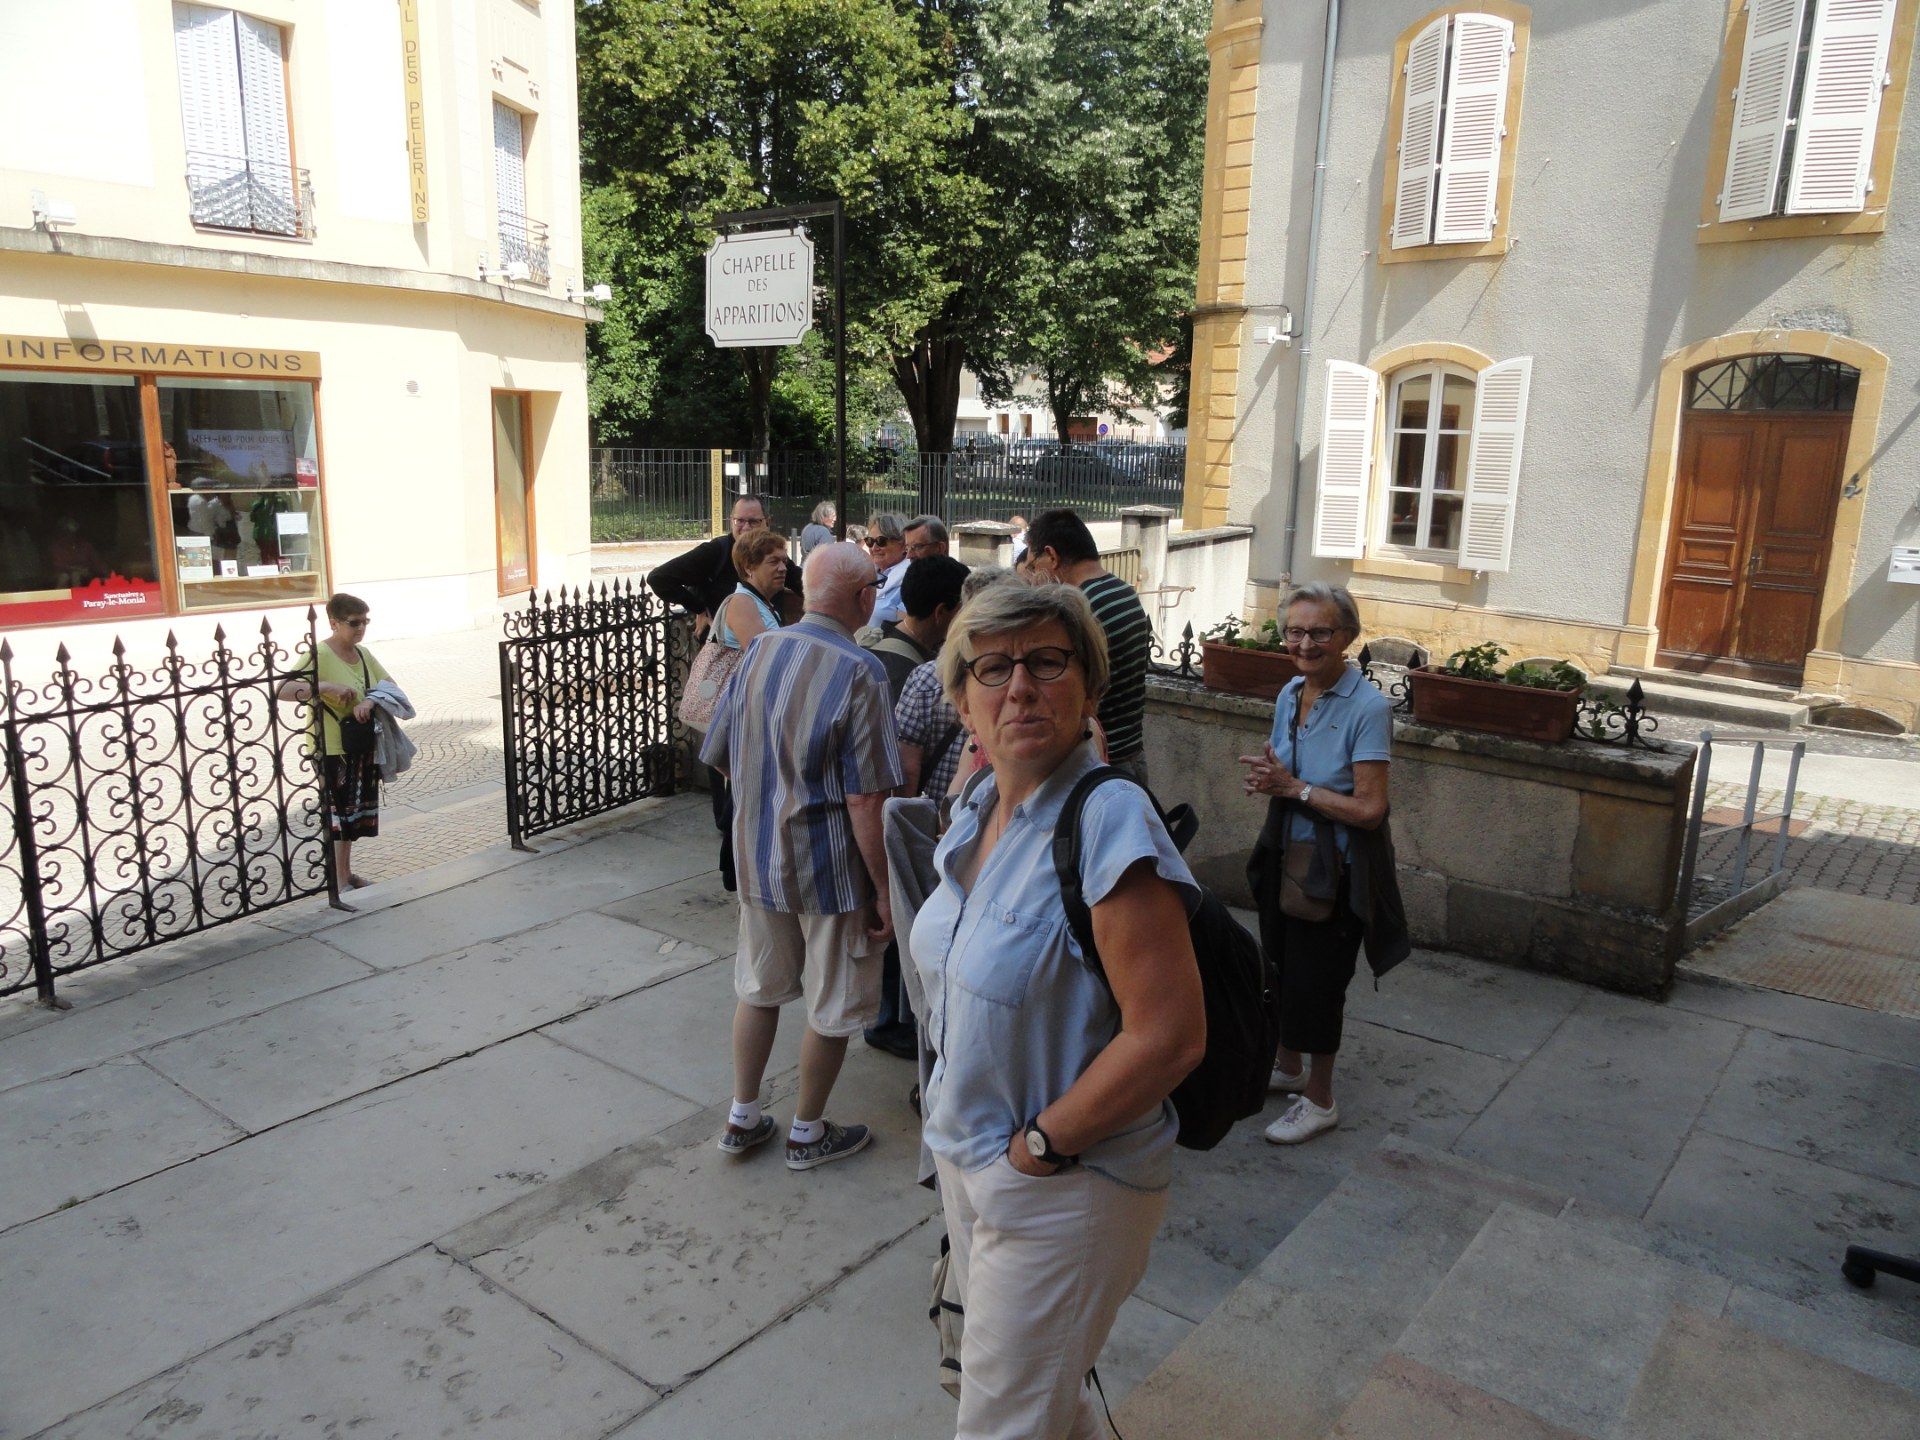 2017-06-16 - Pe#lerinage en Bourgogne - 129